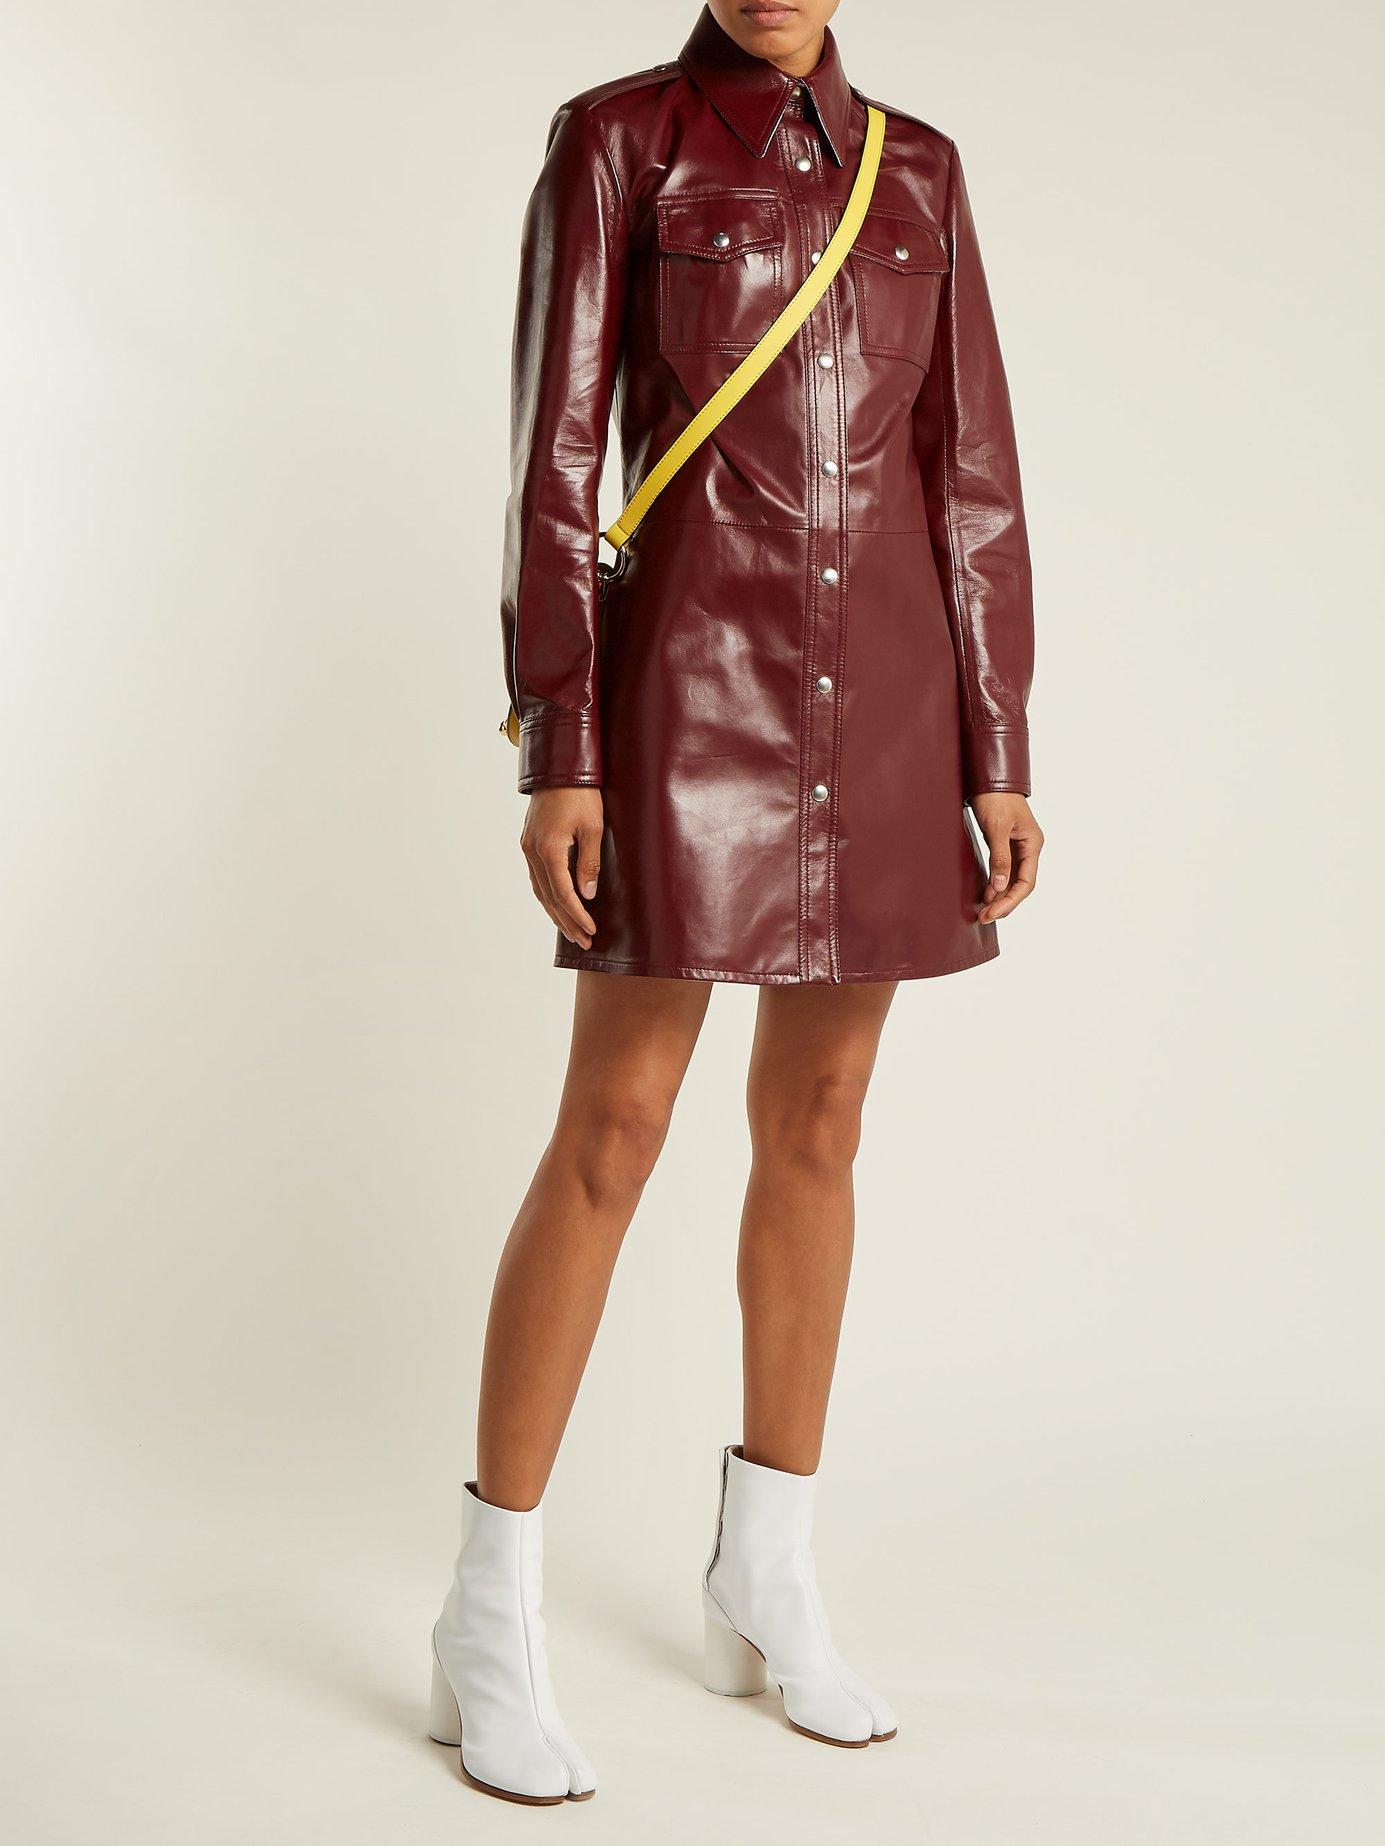 Leather button-through shirtdress by Calvin Klein 205W39Nyc